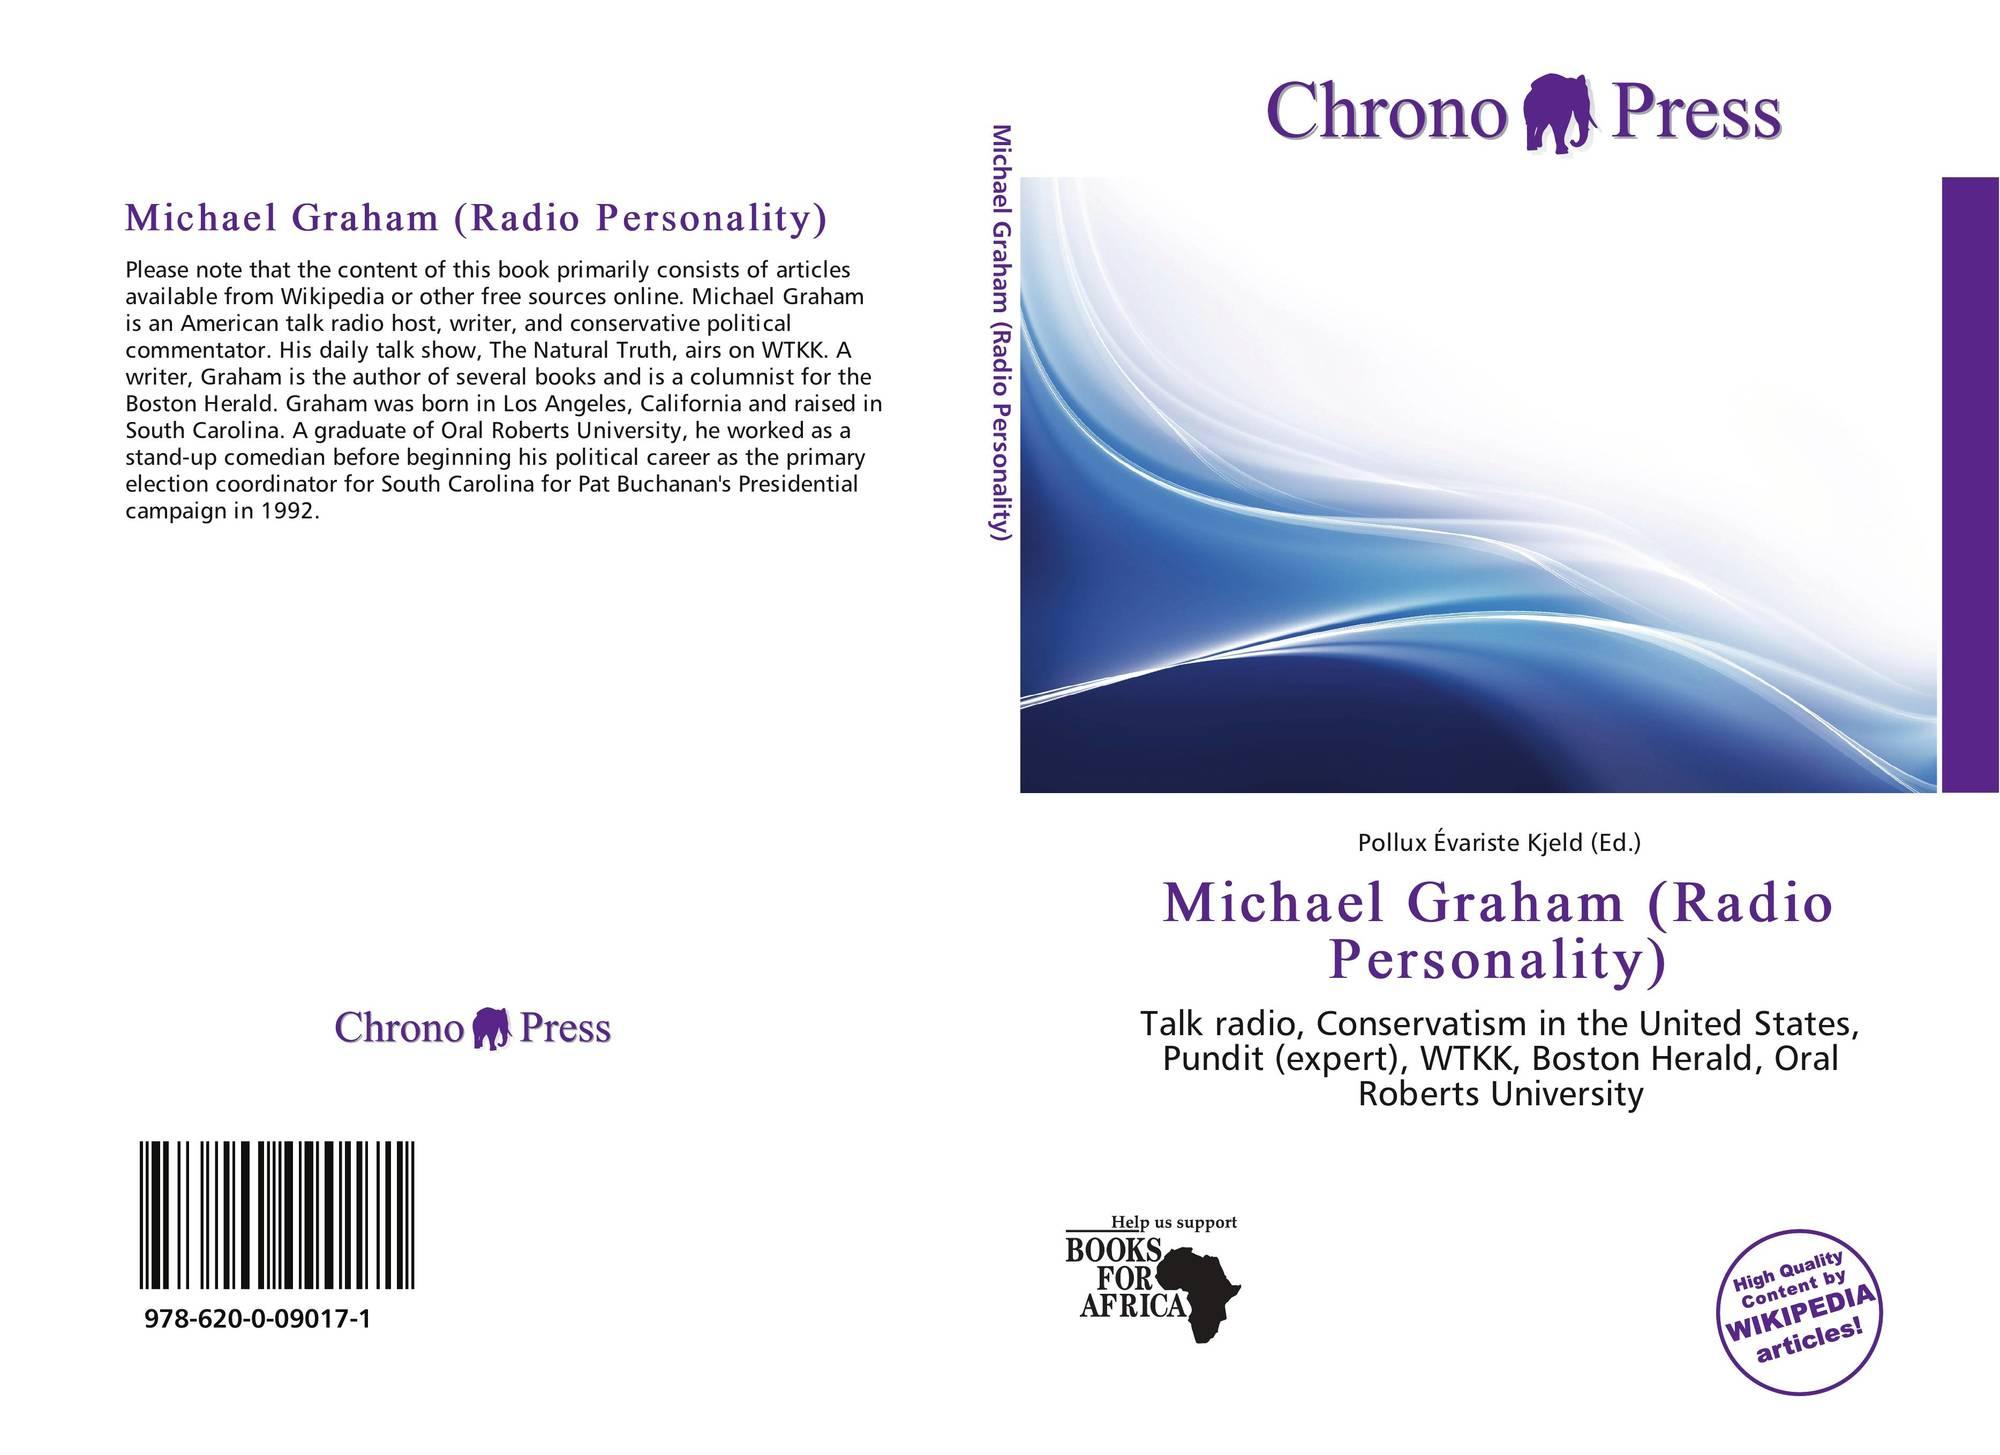 Bookcover Of Michael Graham Radio Personality